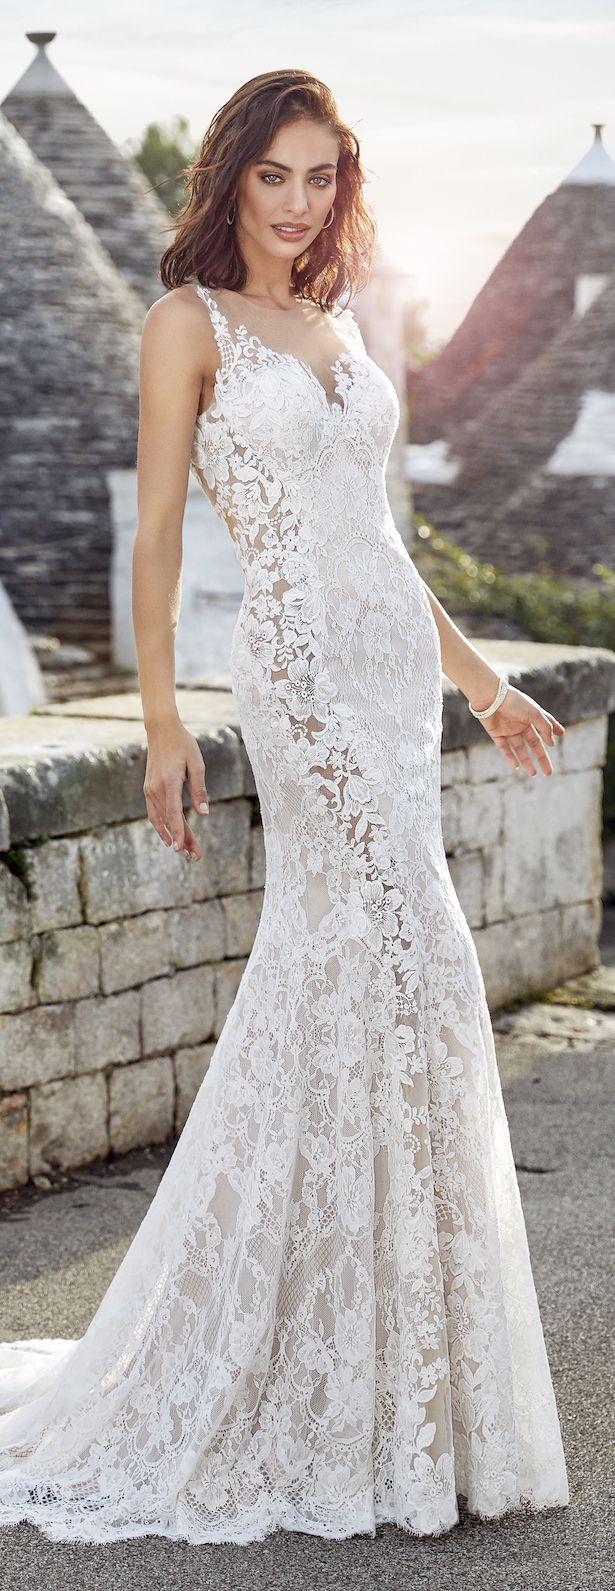 J crew wedding dresses 2018 wedding dresses asian for J crew short wedding dresses